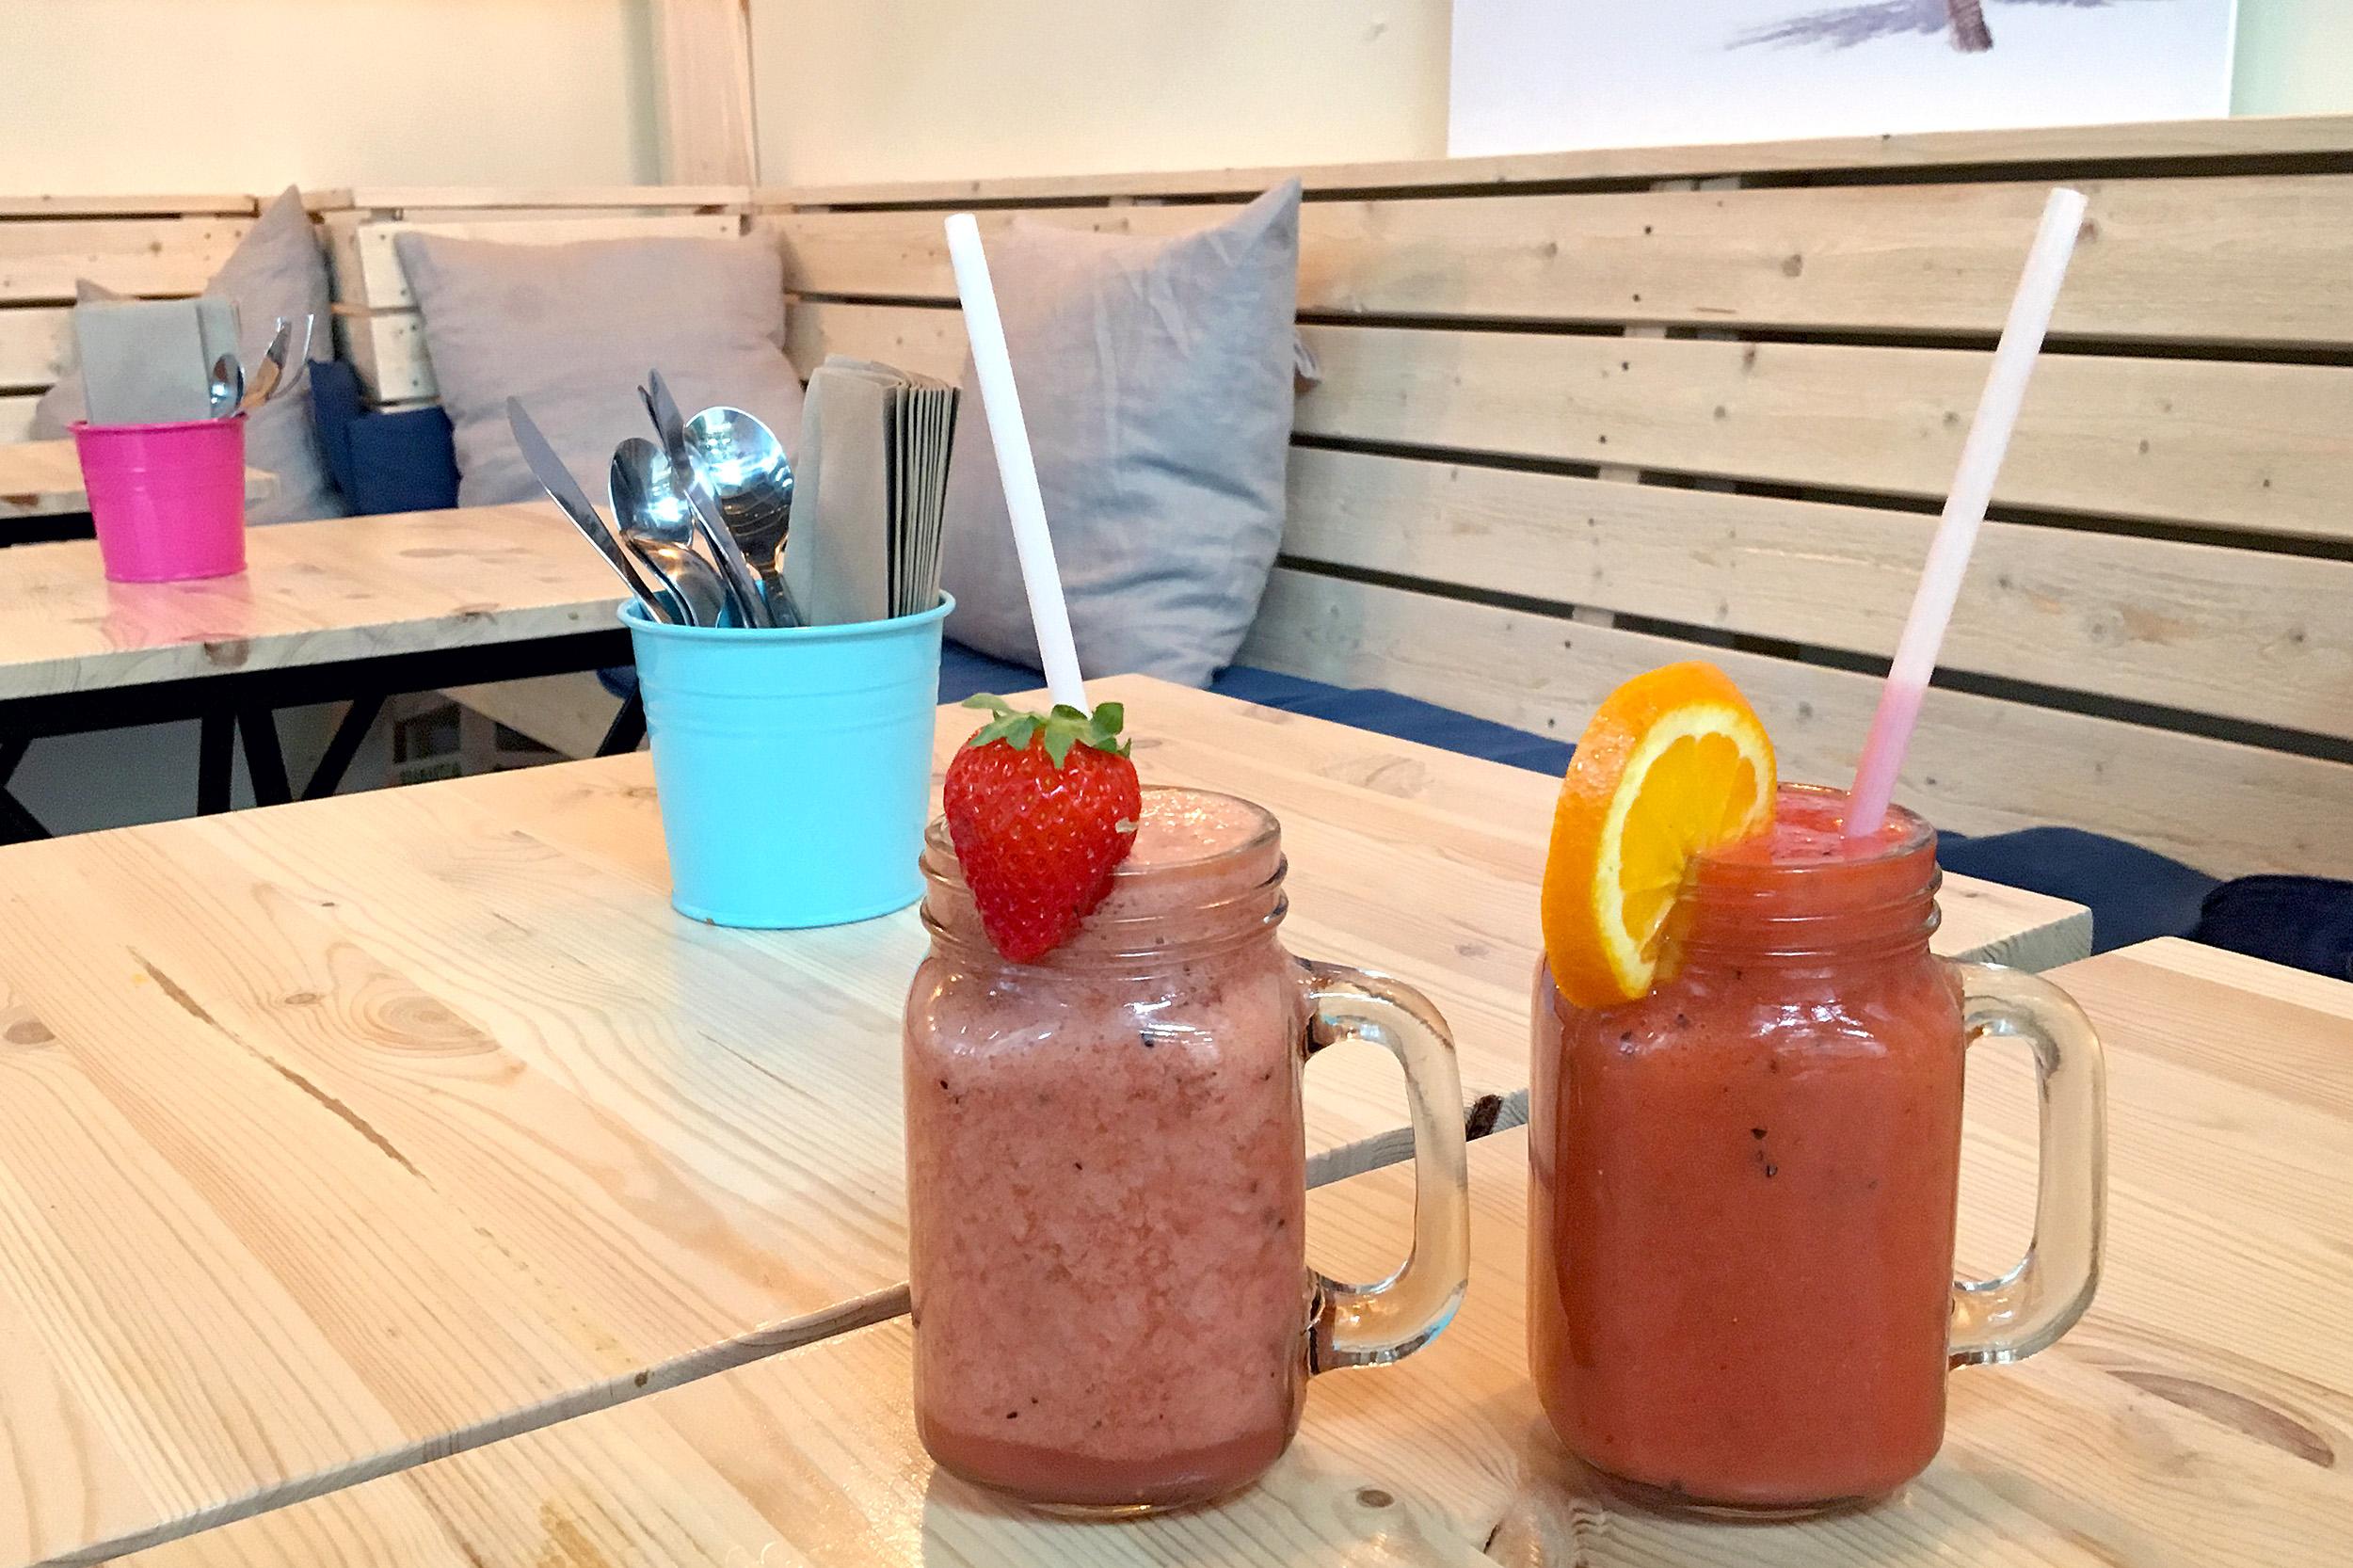 Juice En juicebar Hammarby sjöstad